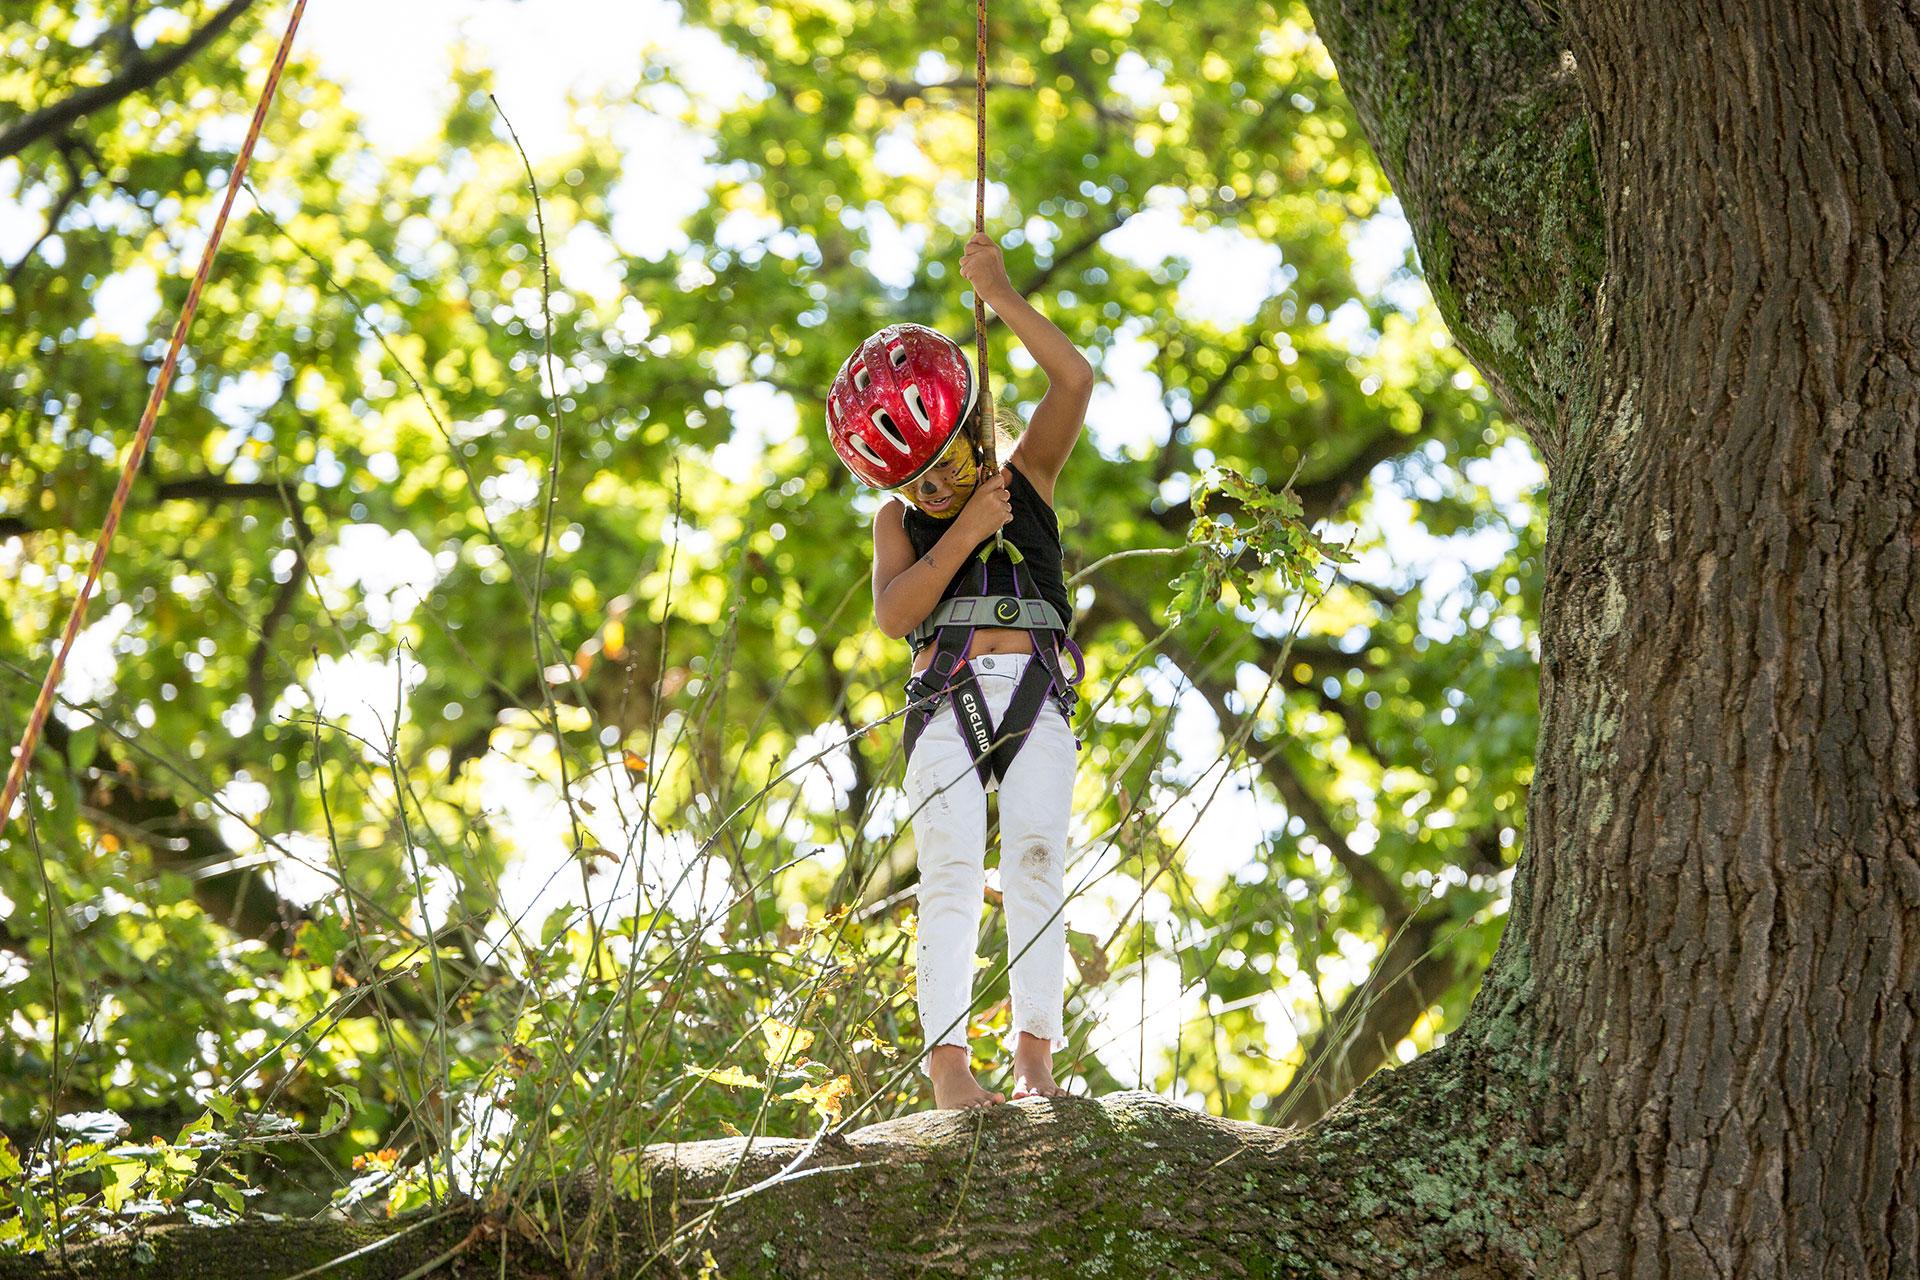 Young Girl Tree Climbing